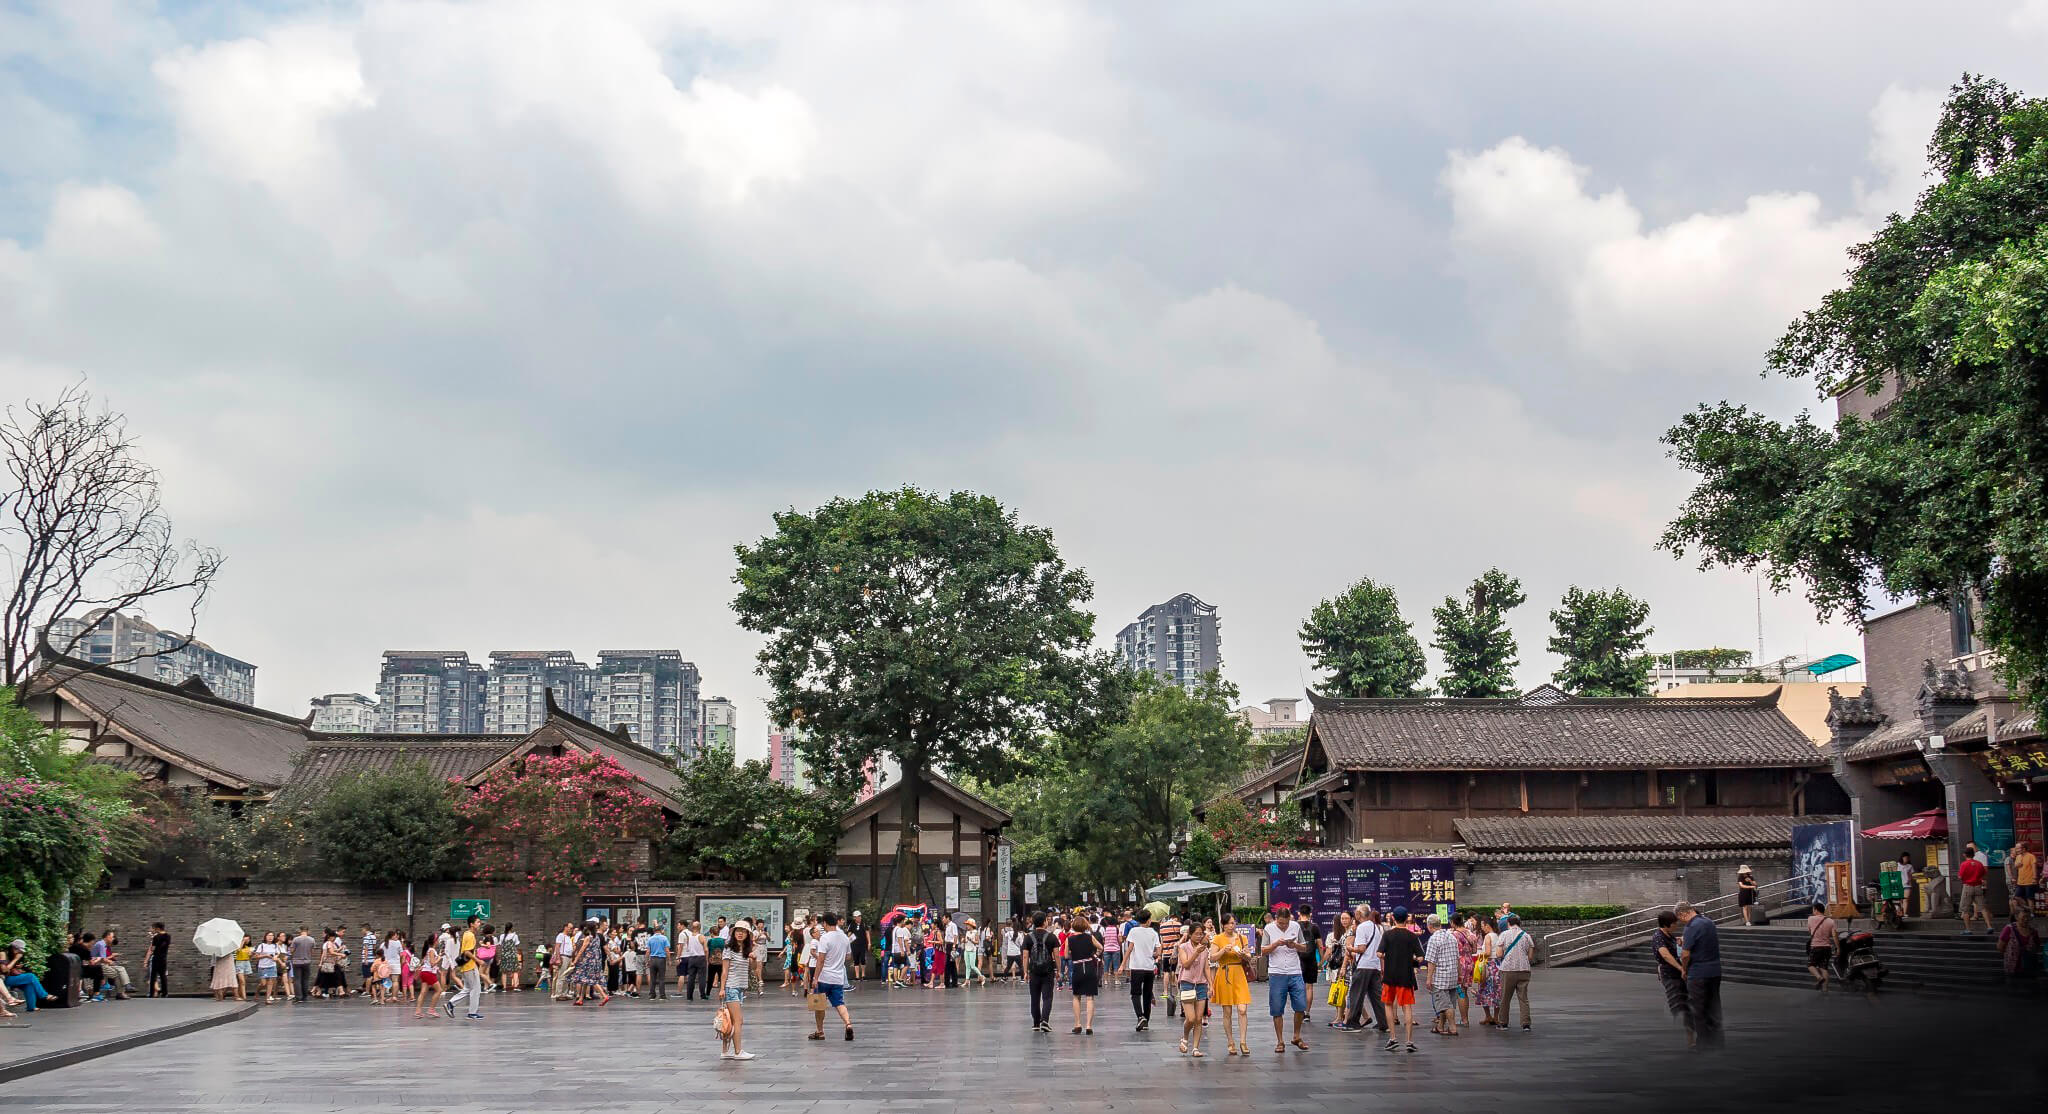 chengdu Kuan-Zhai Alley